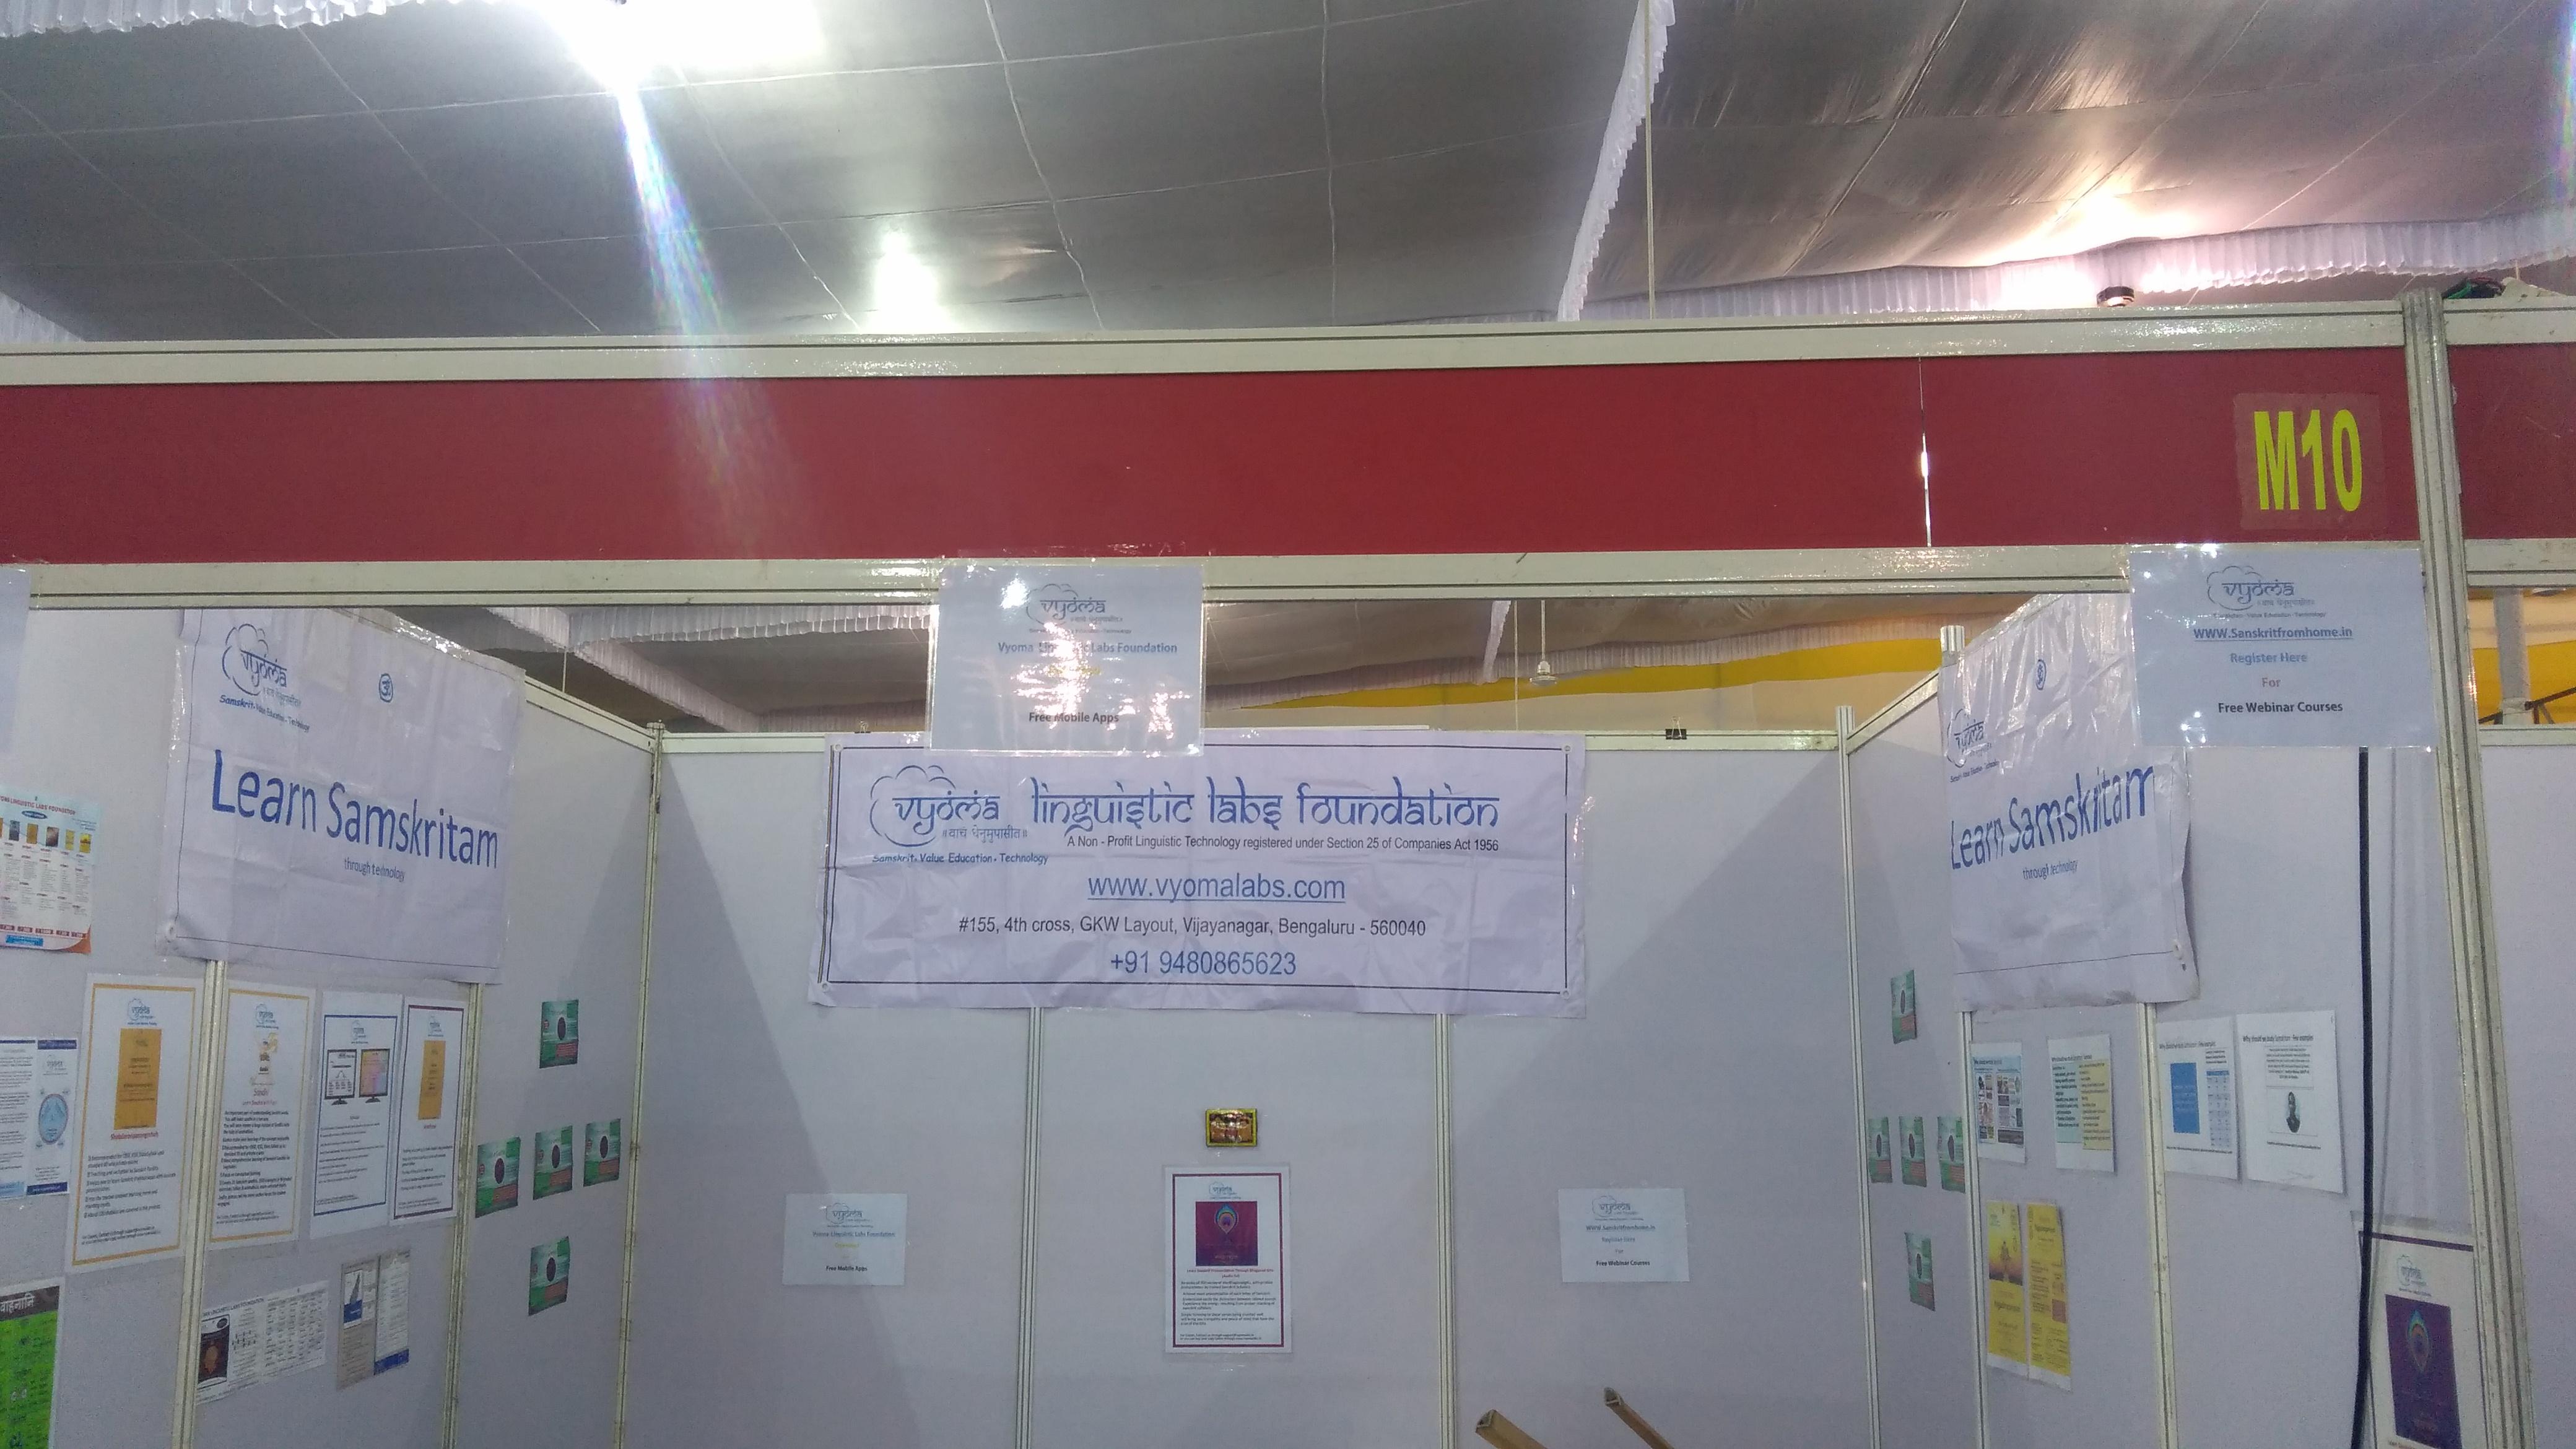 Vyoma stall